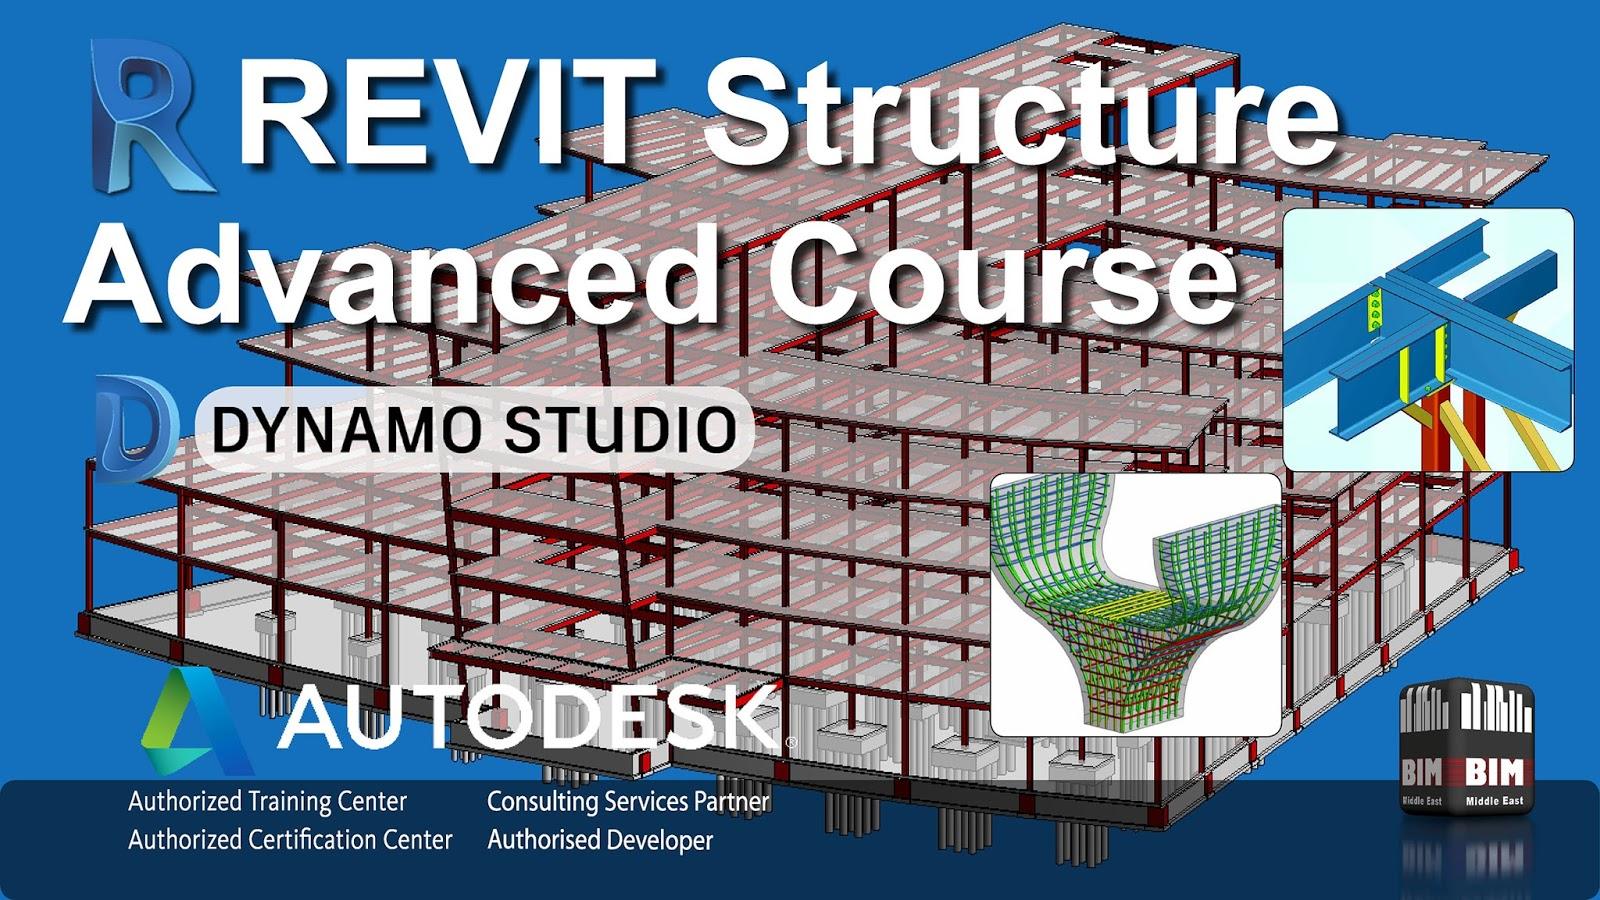 BIM-ME: Autodesk Revit Structure Advanced 2018 Training with Dynamo